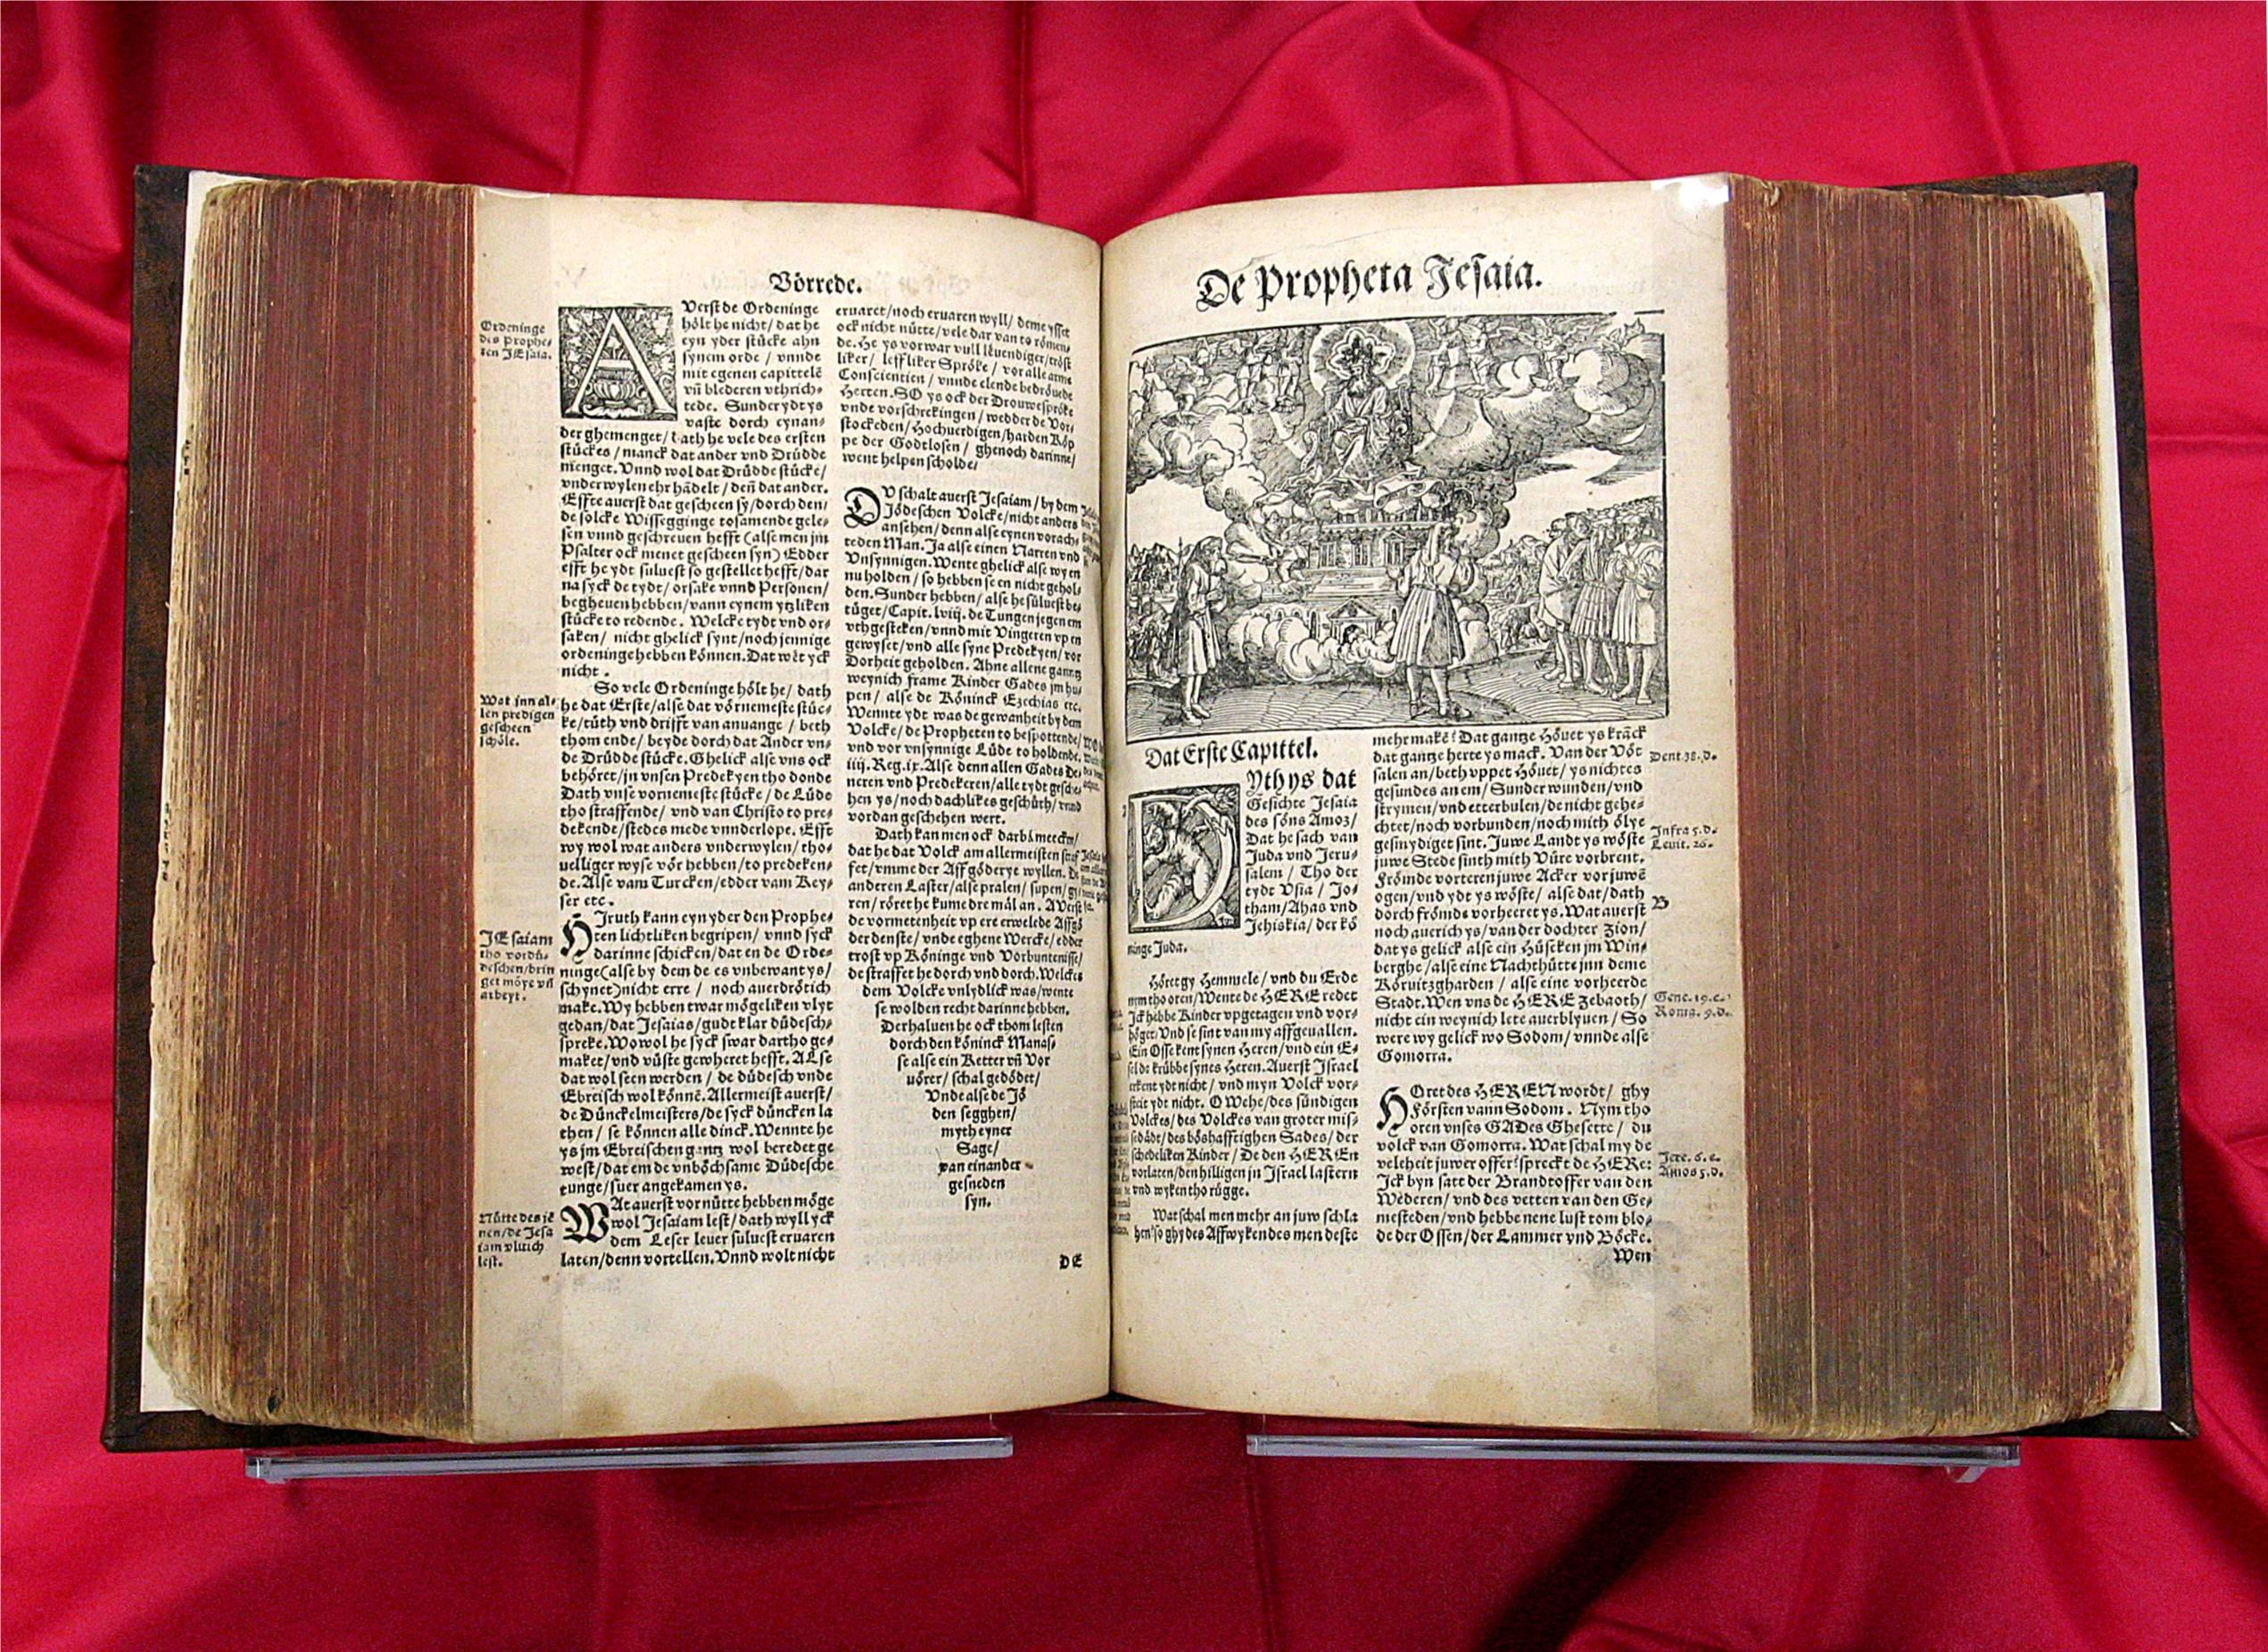 Bibbia di Lutero, 1545. Fonte: http://library.dts.edu/Pages/TL/Special/sc_bibles.shtml